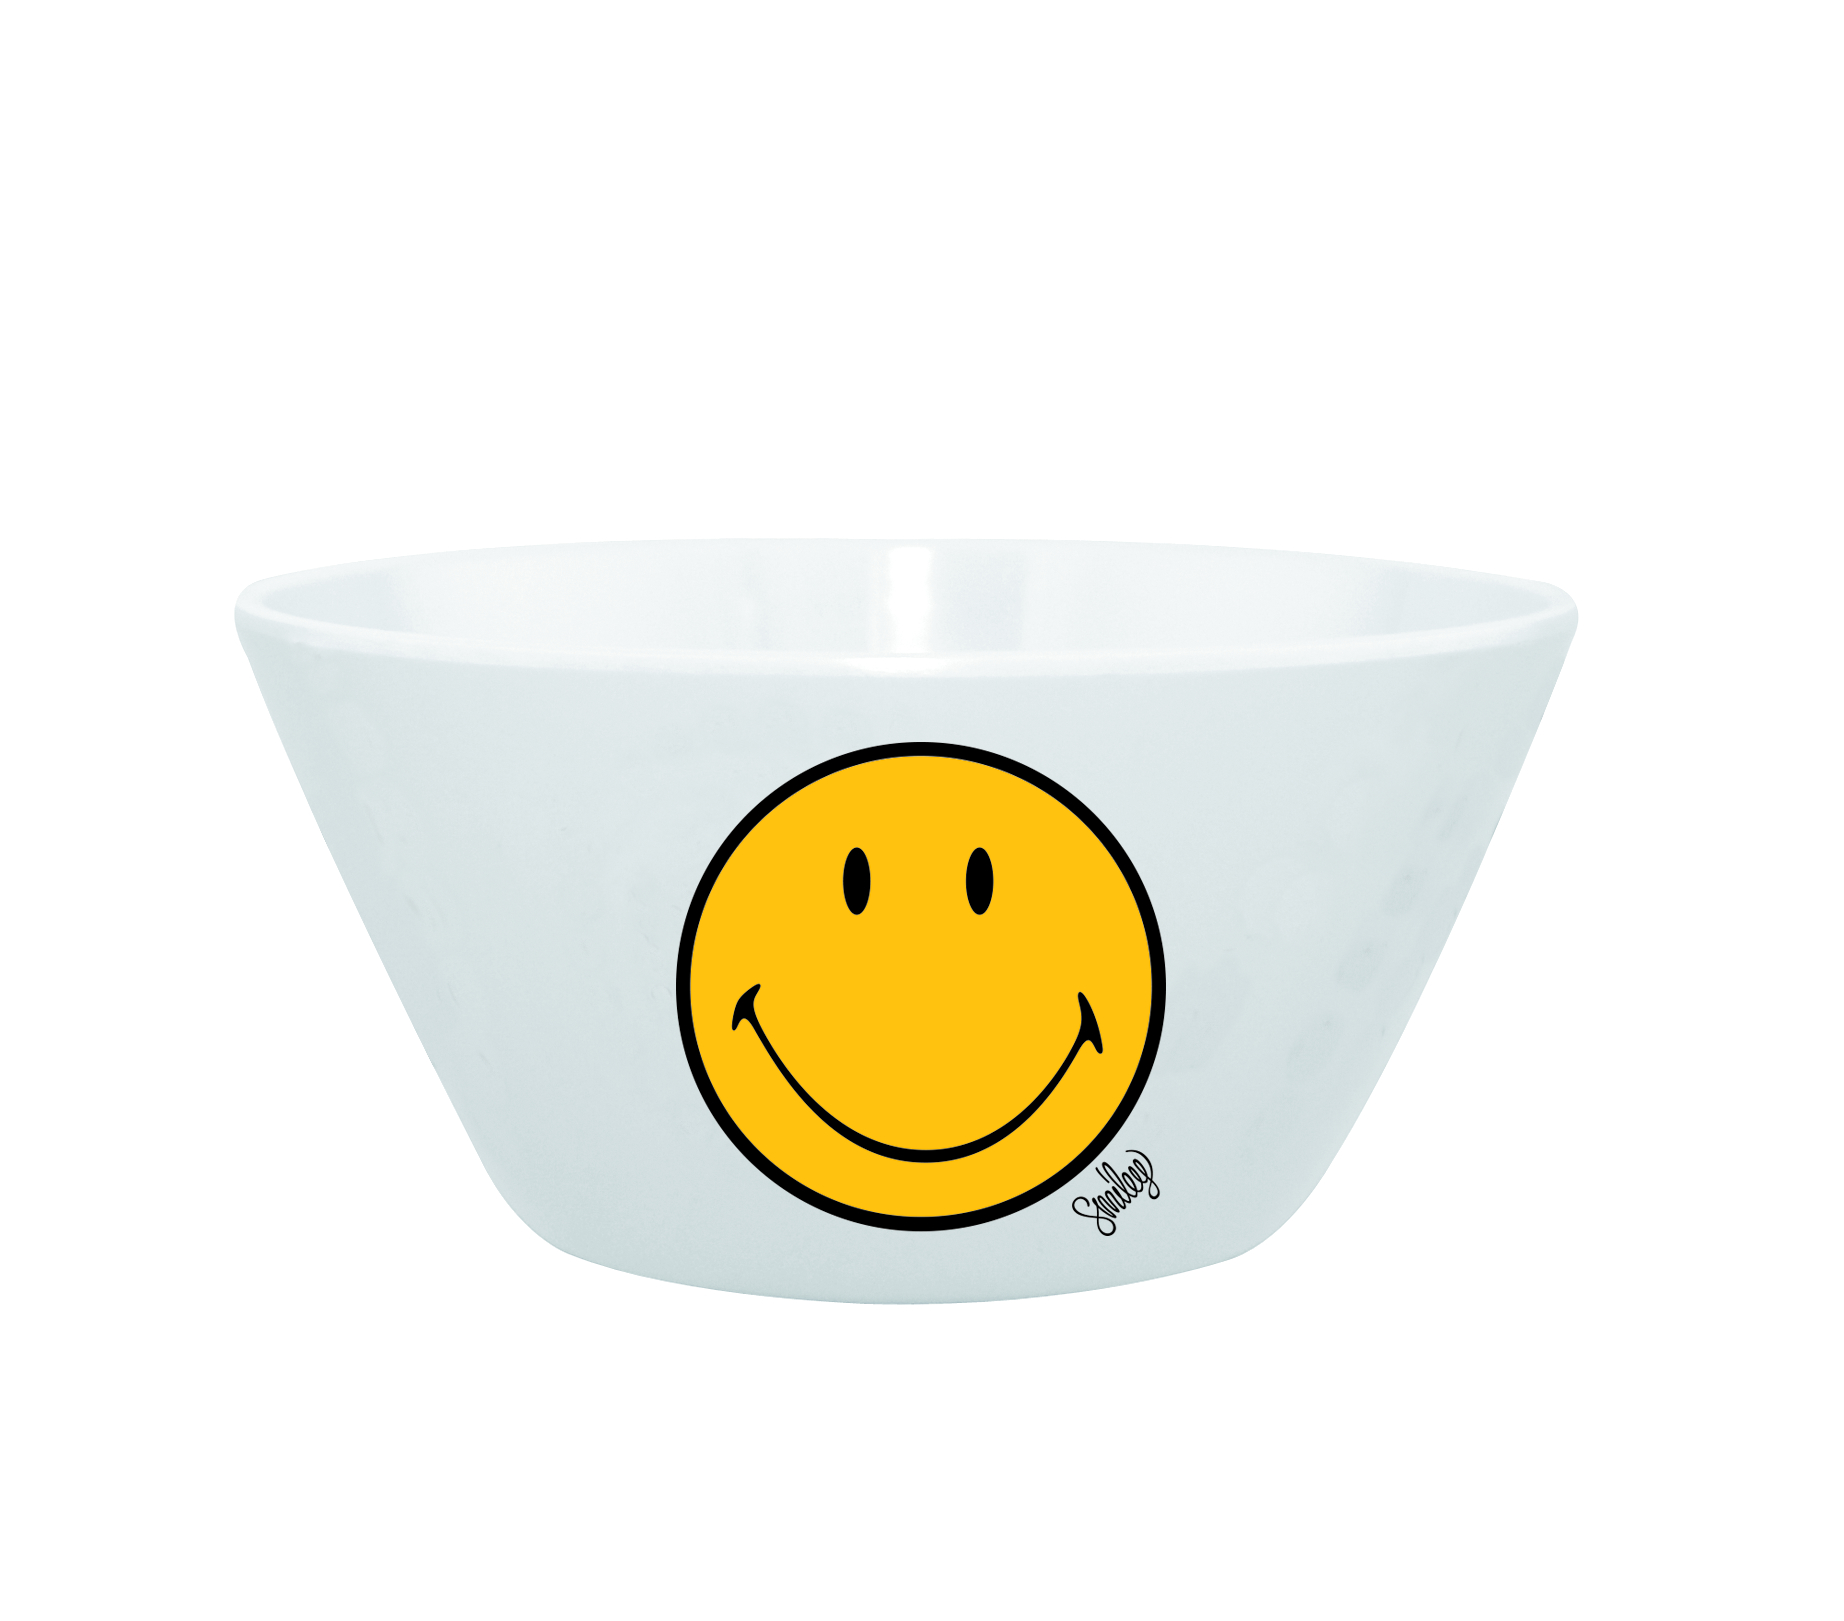 Mini Bol Pentru Cereale Smiley Galben/alb Ø15 Cm